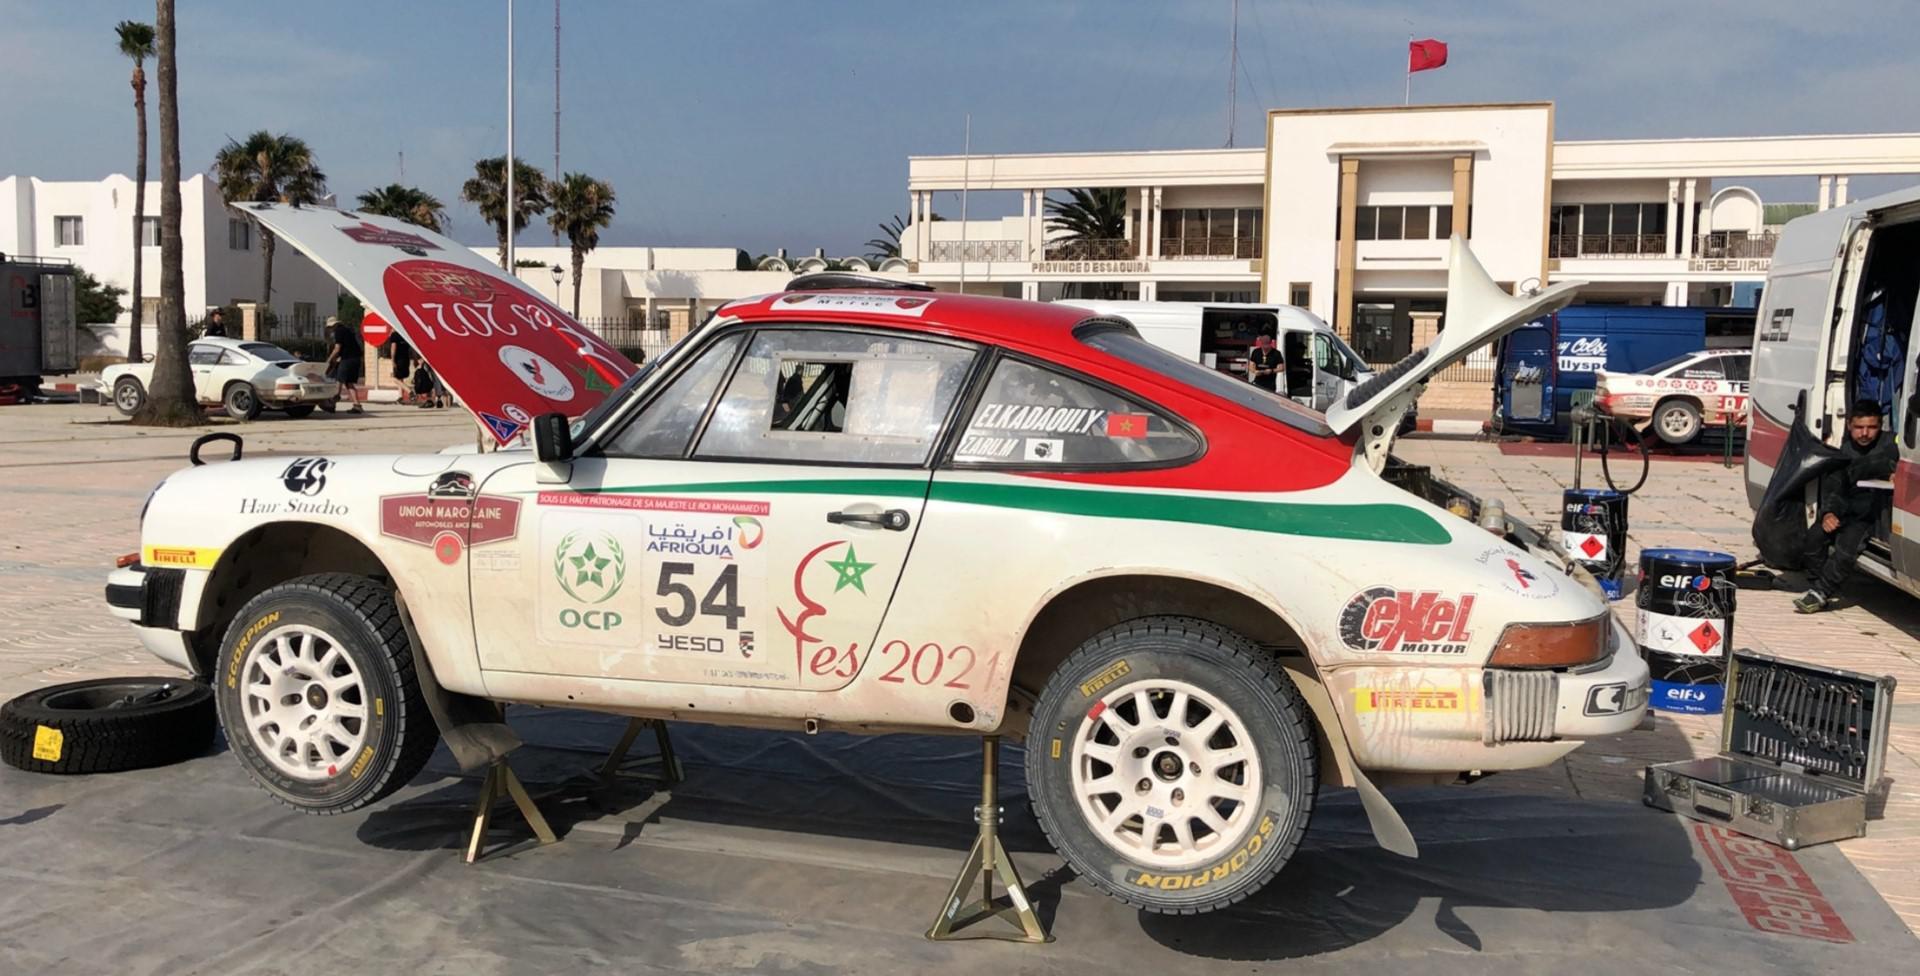 un-talentueux-pilote-marocain-decouvert-grace-au-maroc-historic-rally-1081-14.jpg